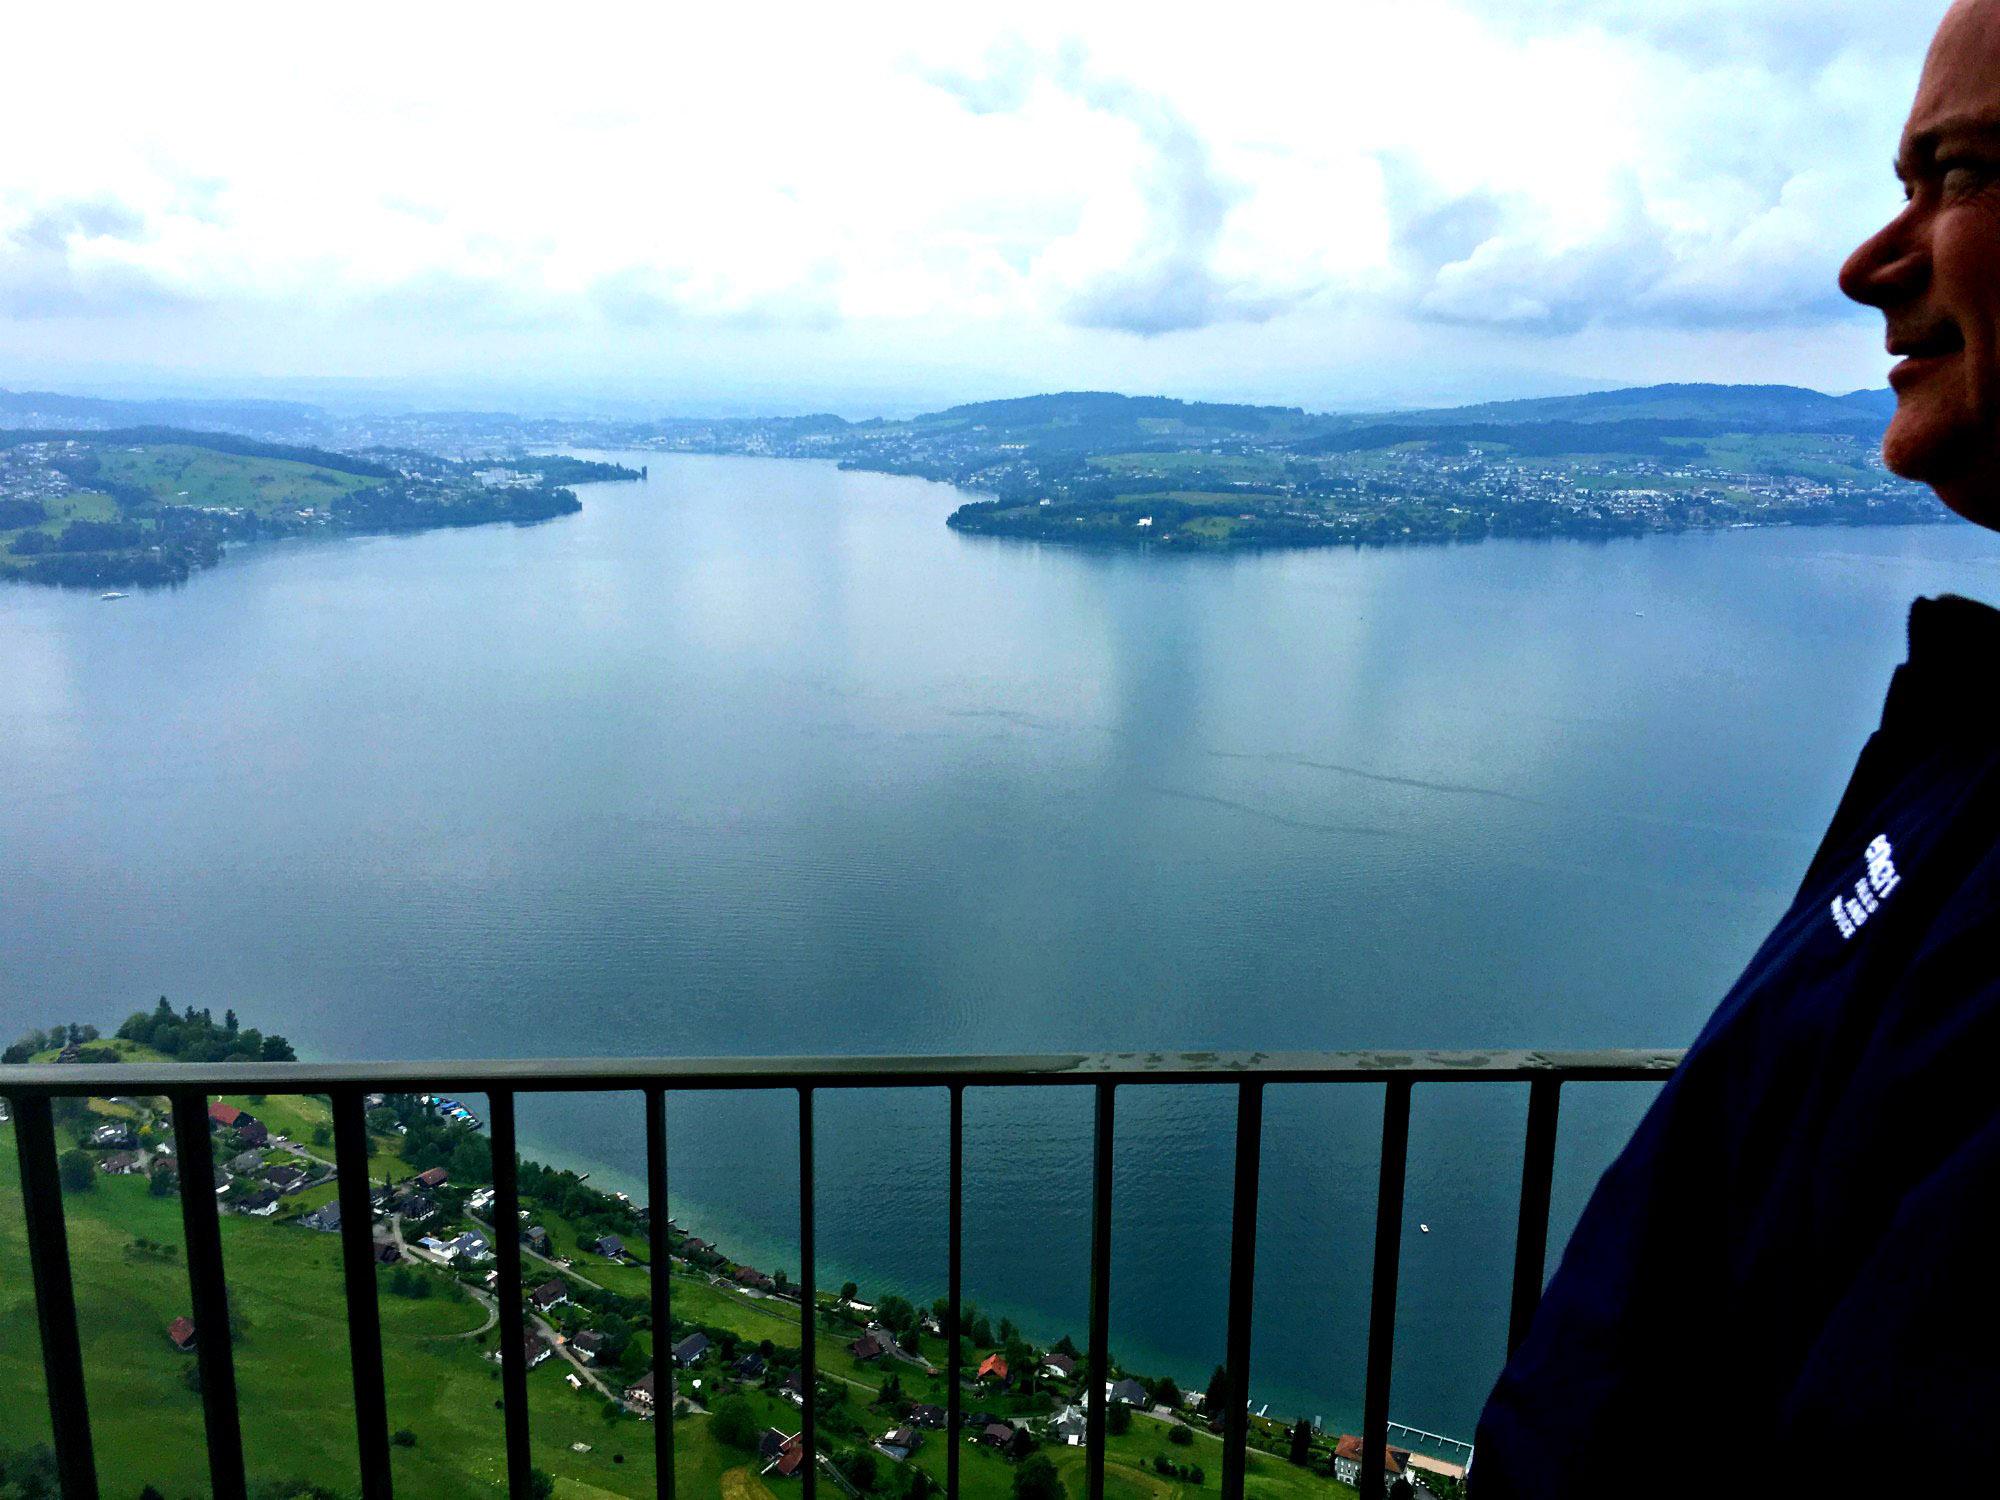 View of Lake Lucerne from Bürgenstock Resort